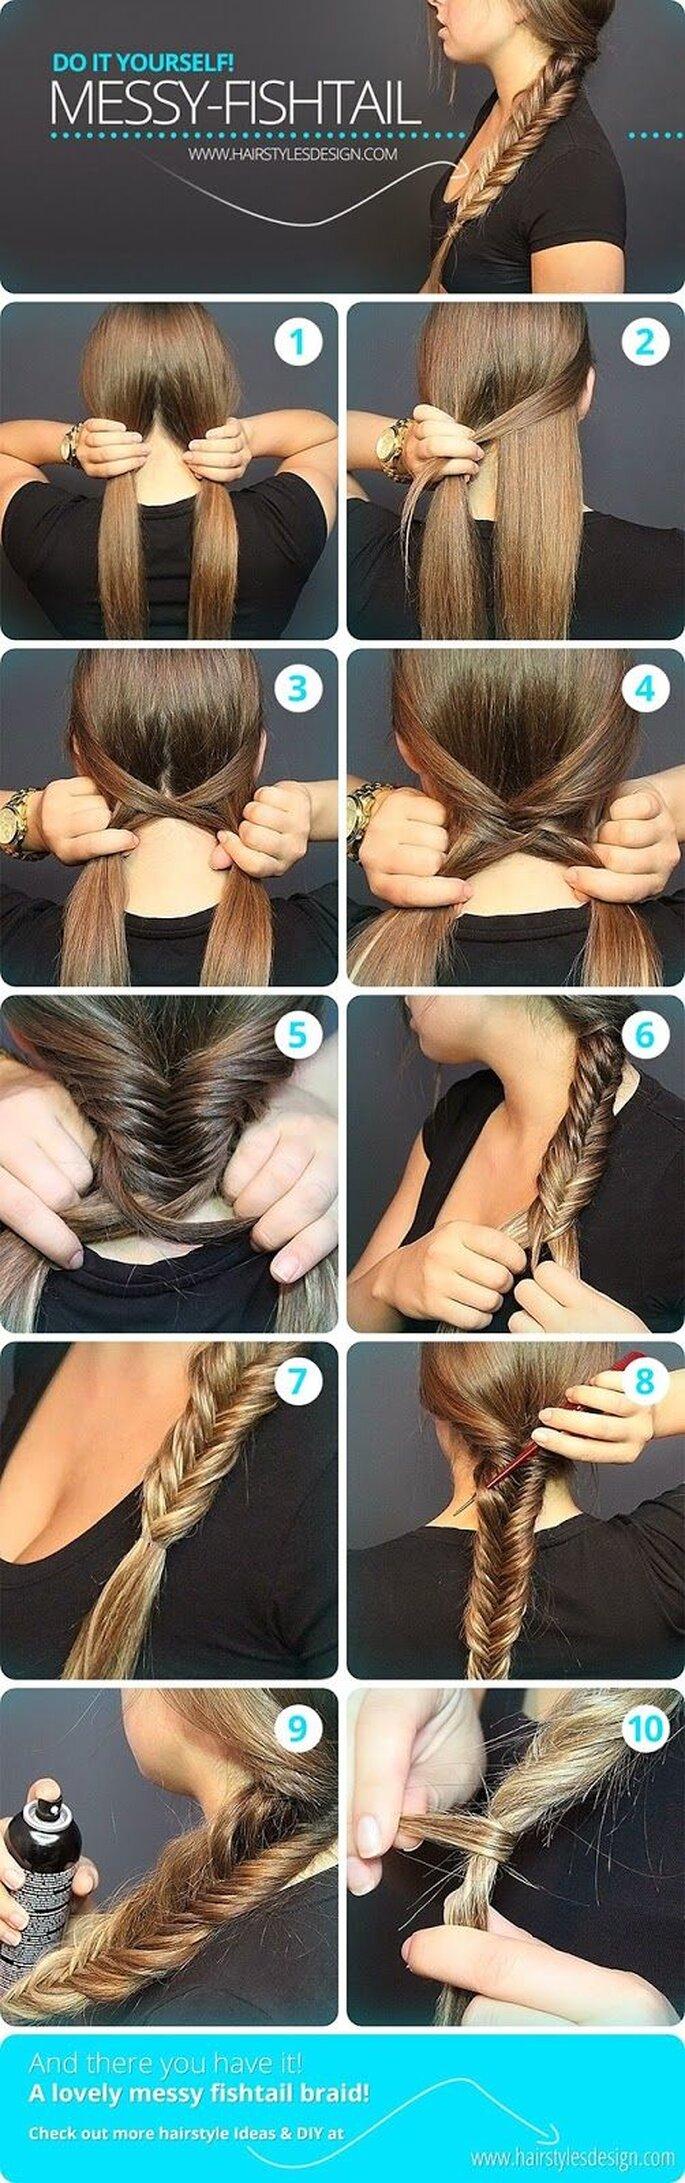 Pinterest/www.hairstyledesign.com